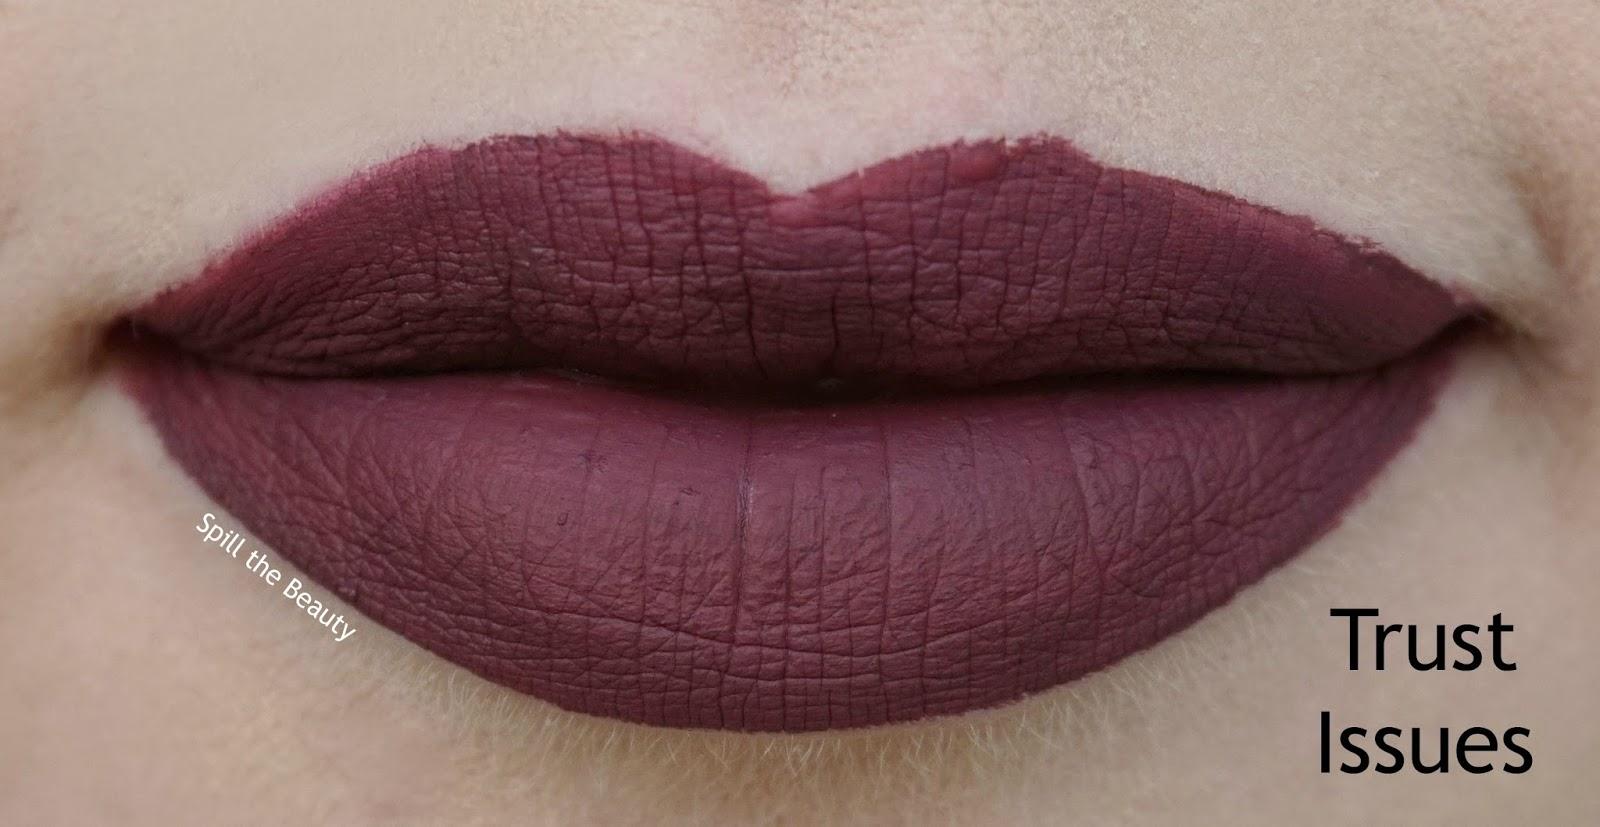 lip swatch comparison dupe anastasia beverly hills liquid lipstick trust issues colourpop h & m